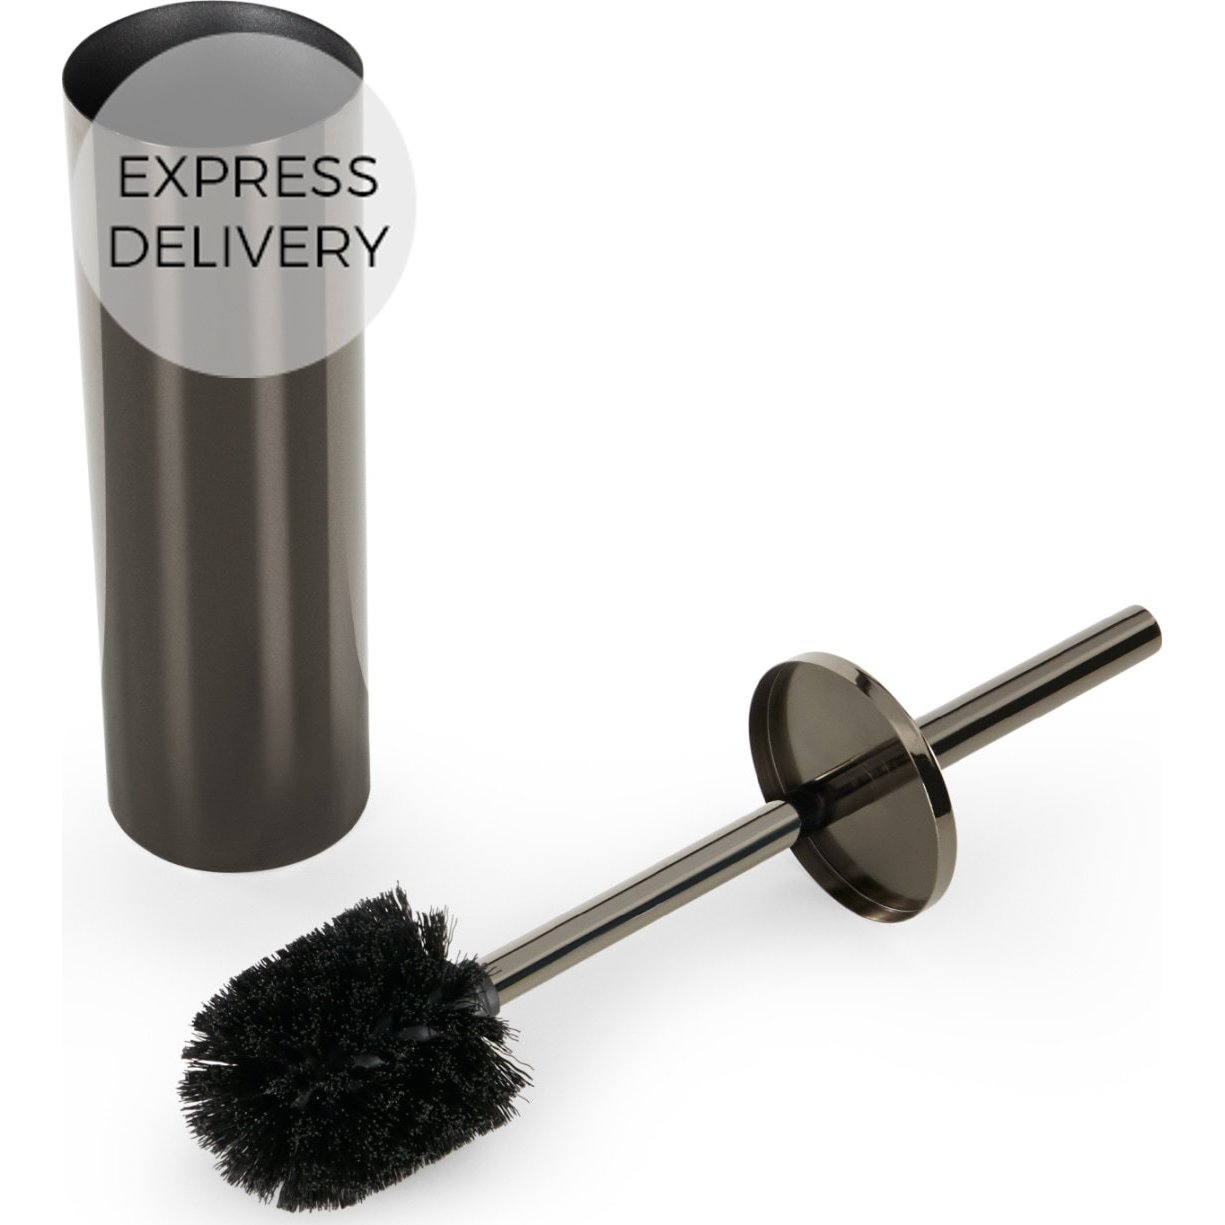 image-Lilo Toilet Brush, Black Nickel